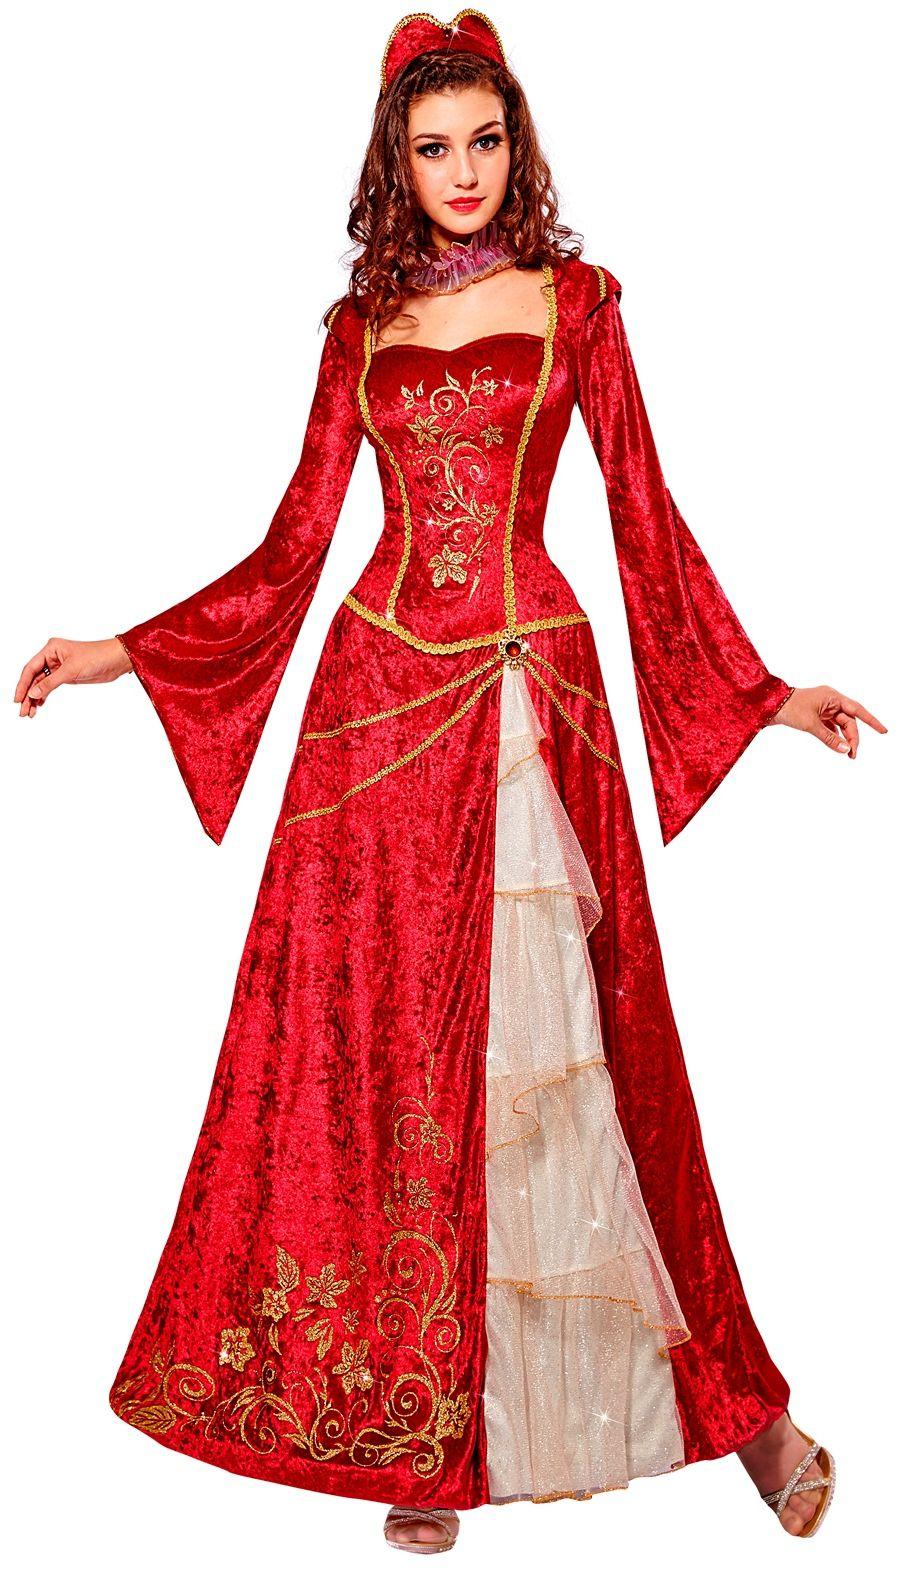 Renaissance prinsessenjurk